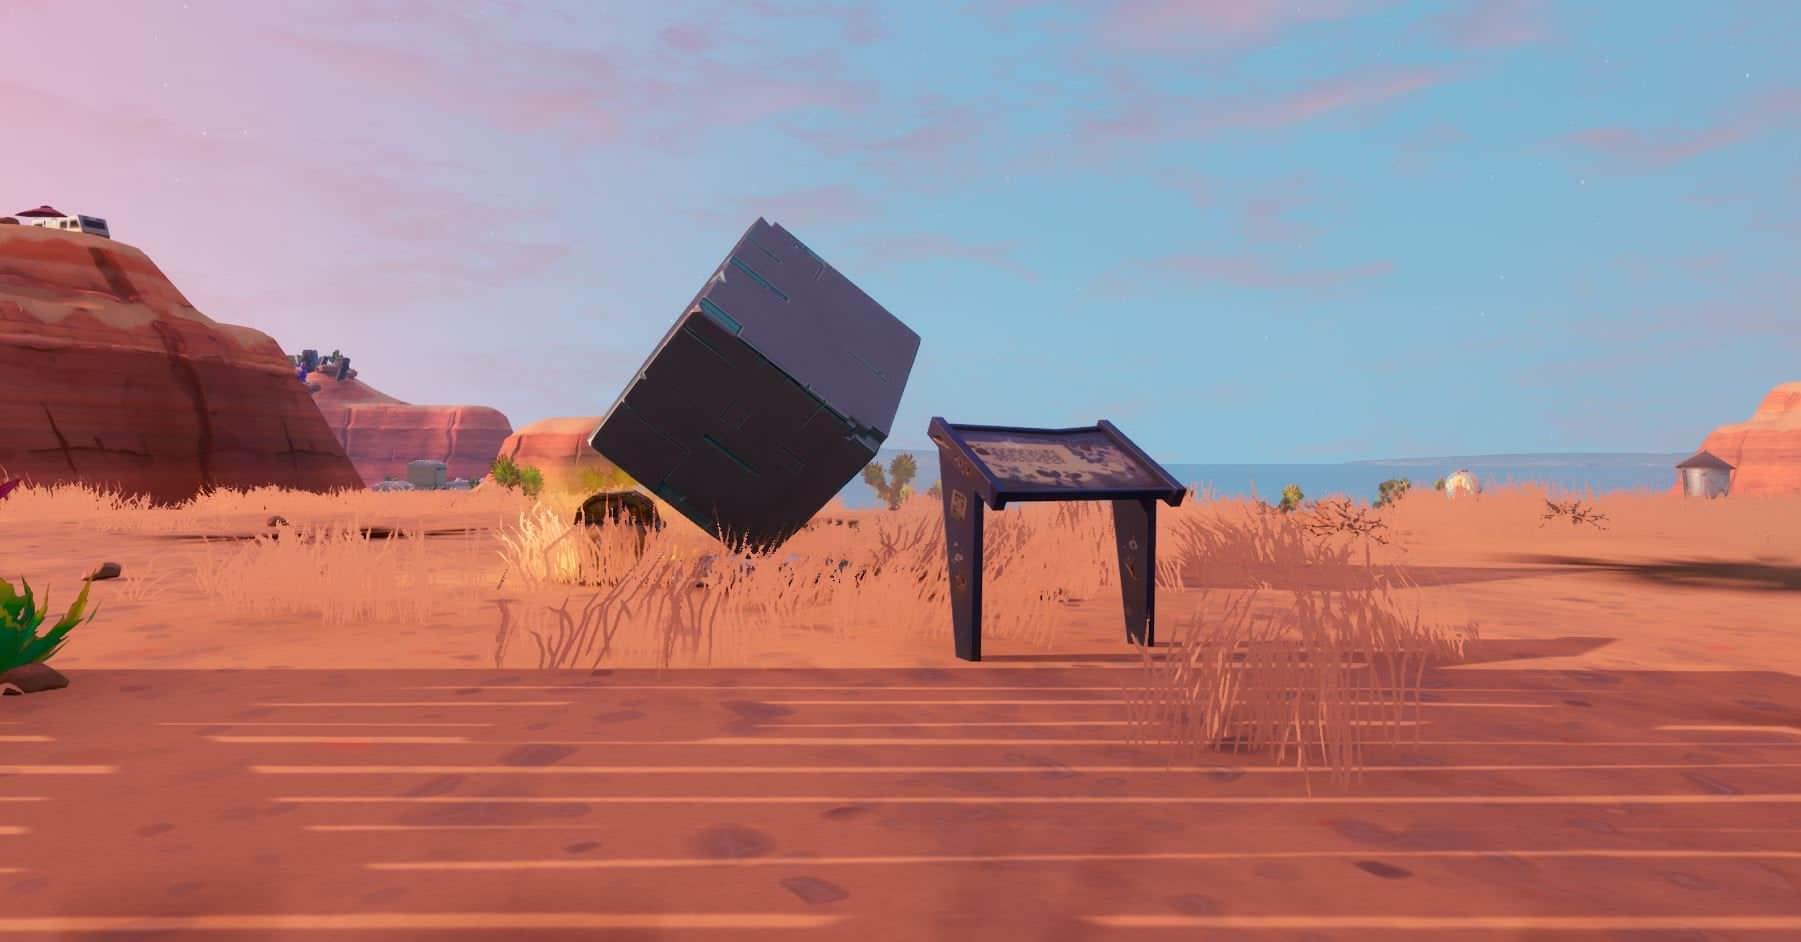 Fortnite Dónde visitar un Monumento de un Cubo - Choque de Mundos Temporada 10